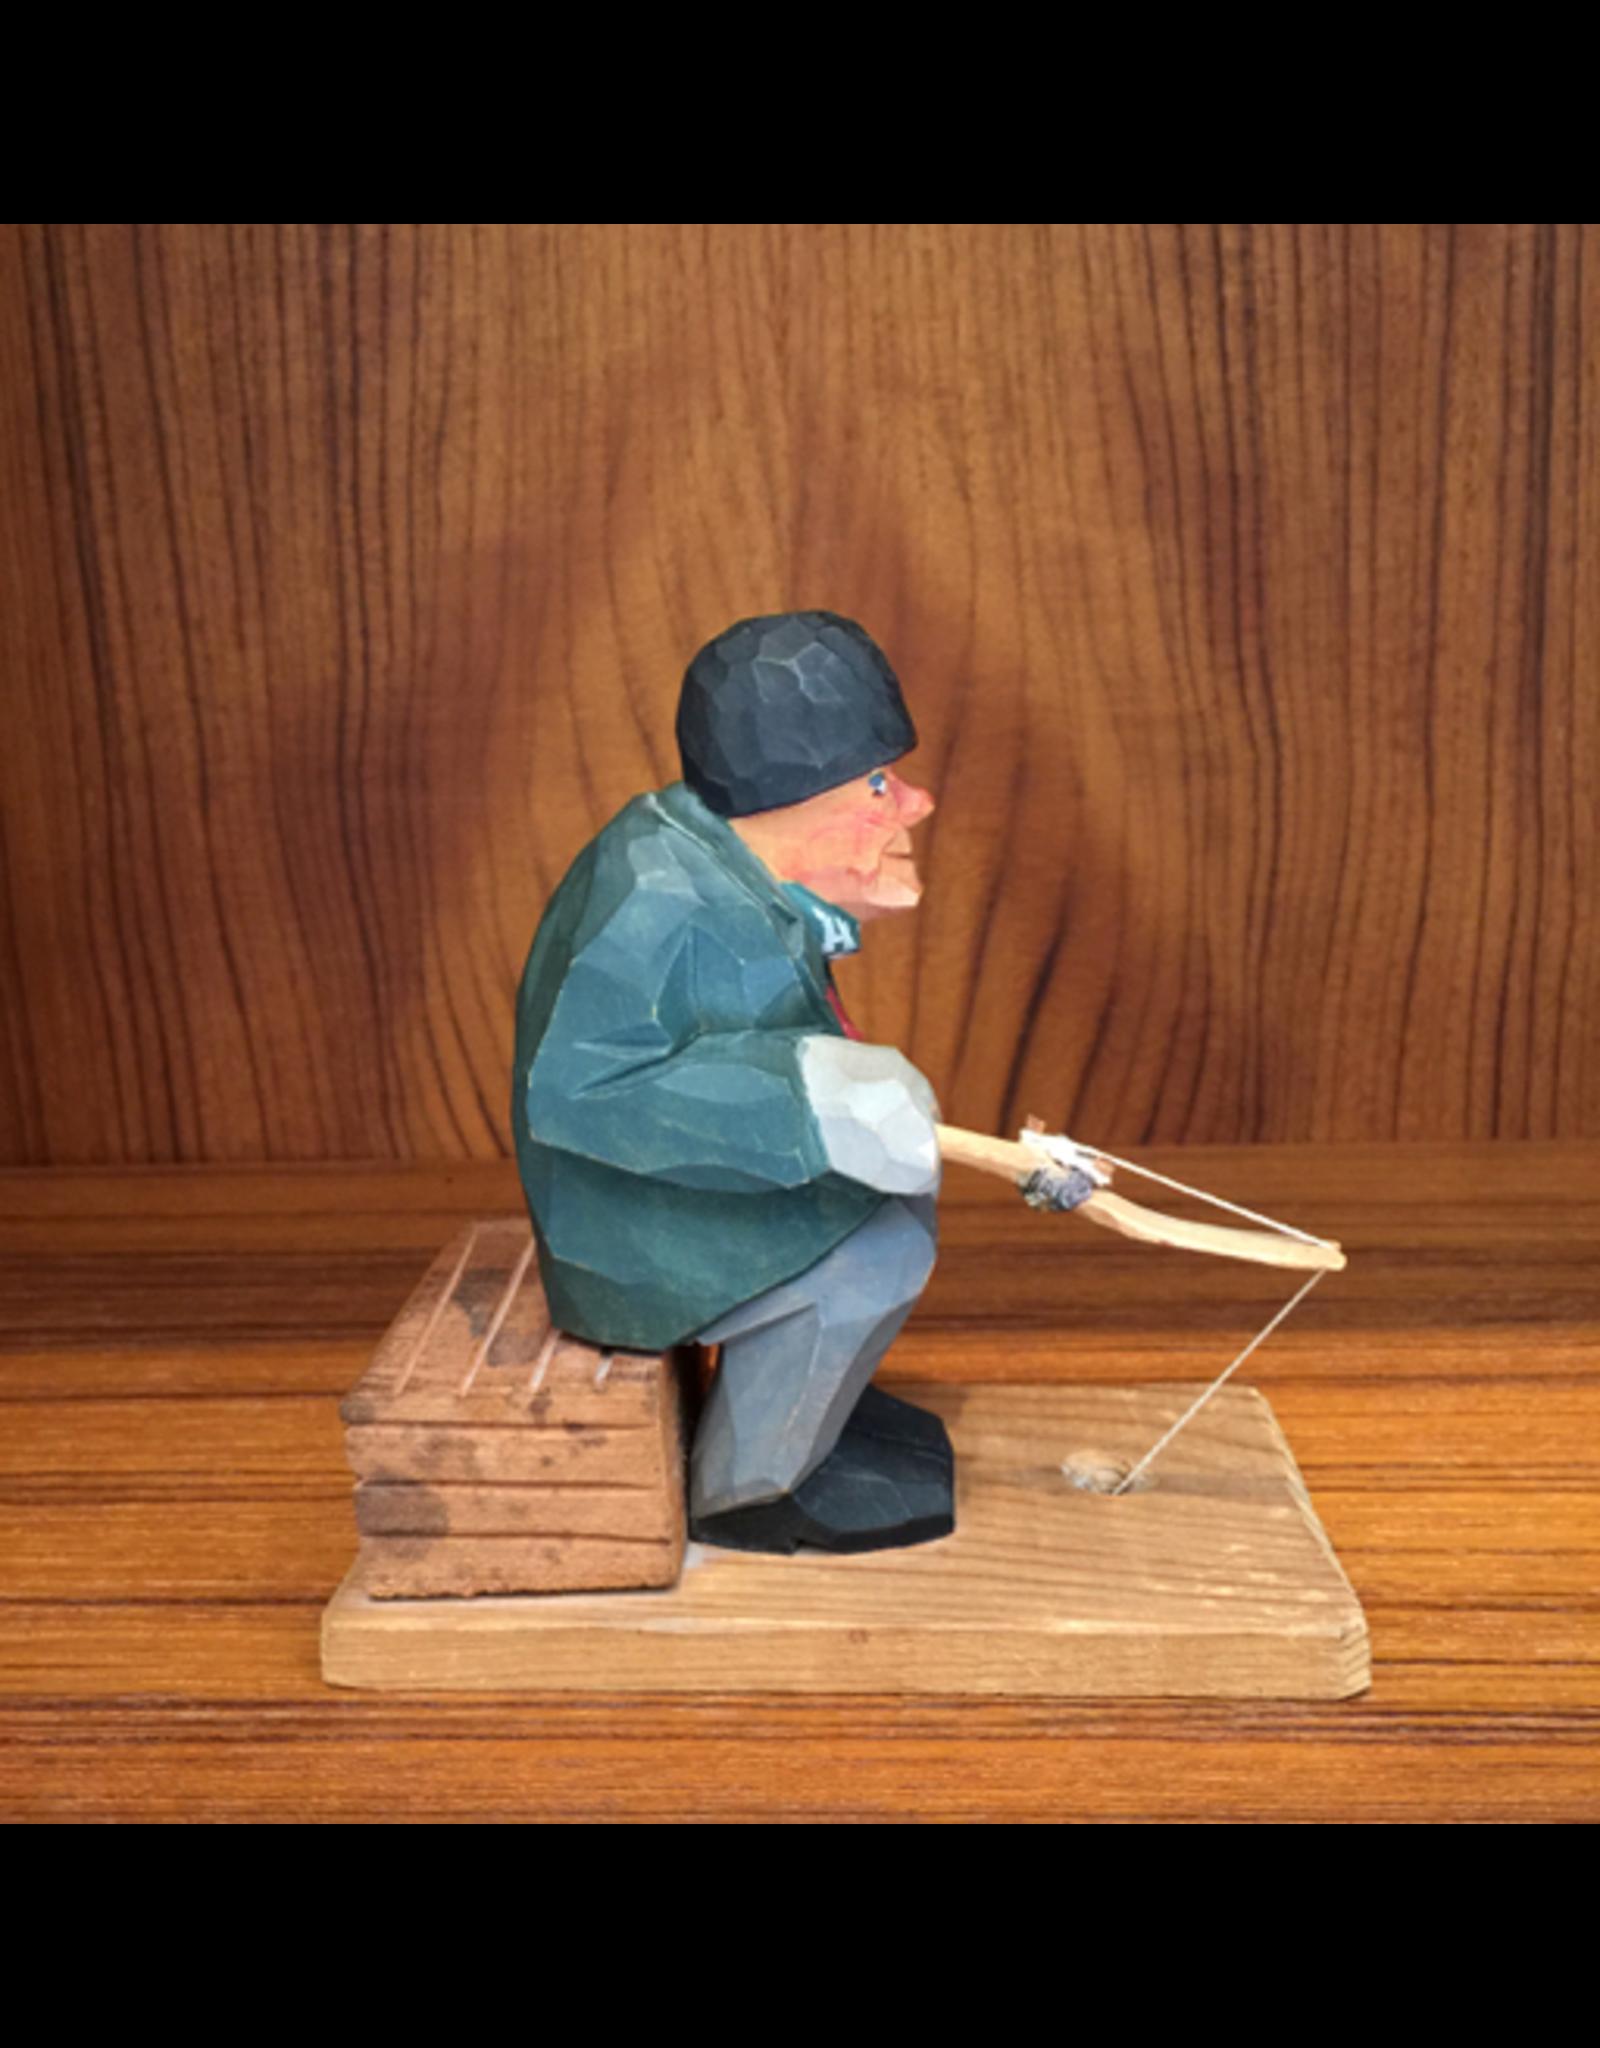 MANKS ANTIQUES PAINTED WOOD CARVING 老瑞典人钓鱼油彩木雕刻